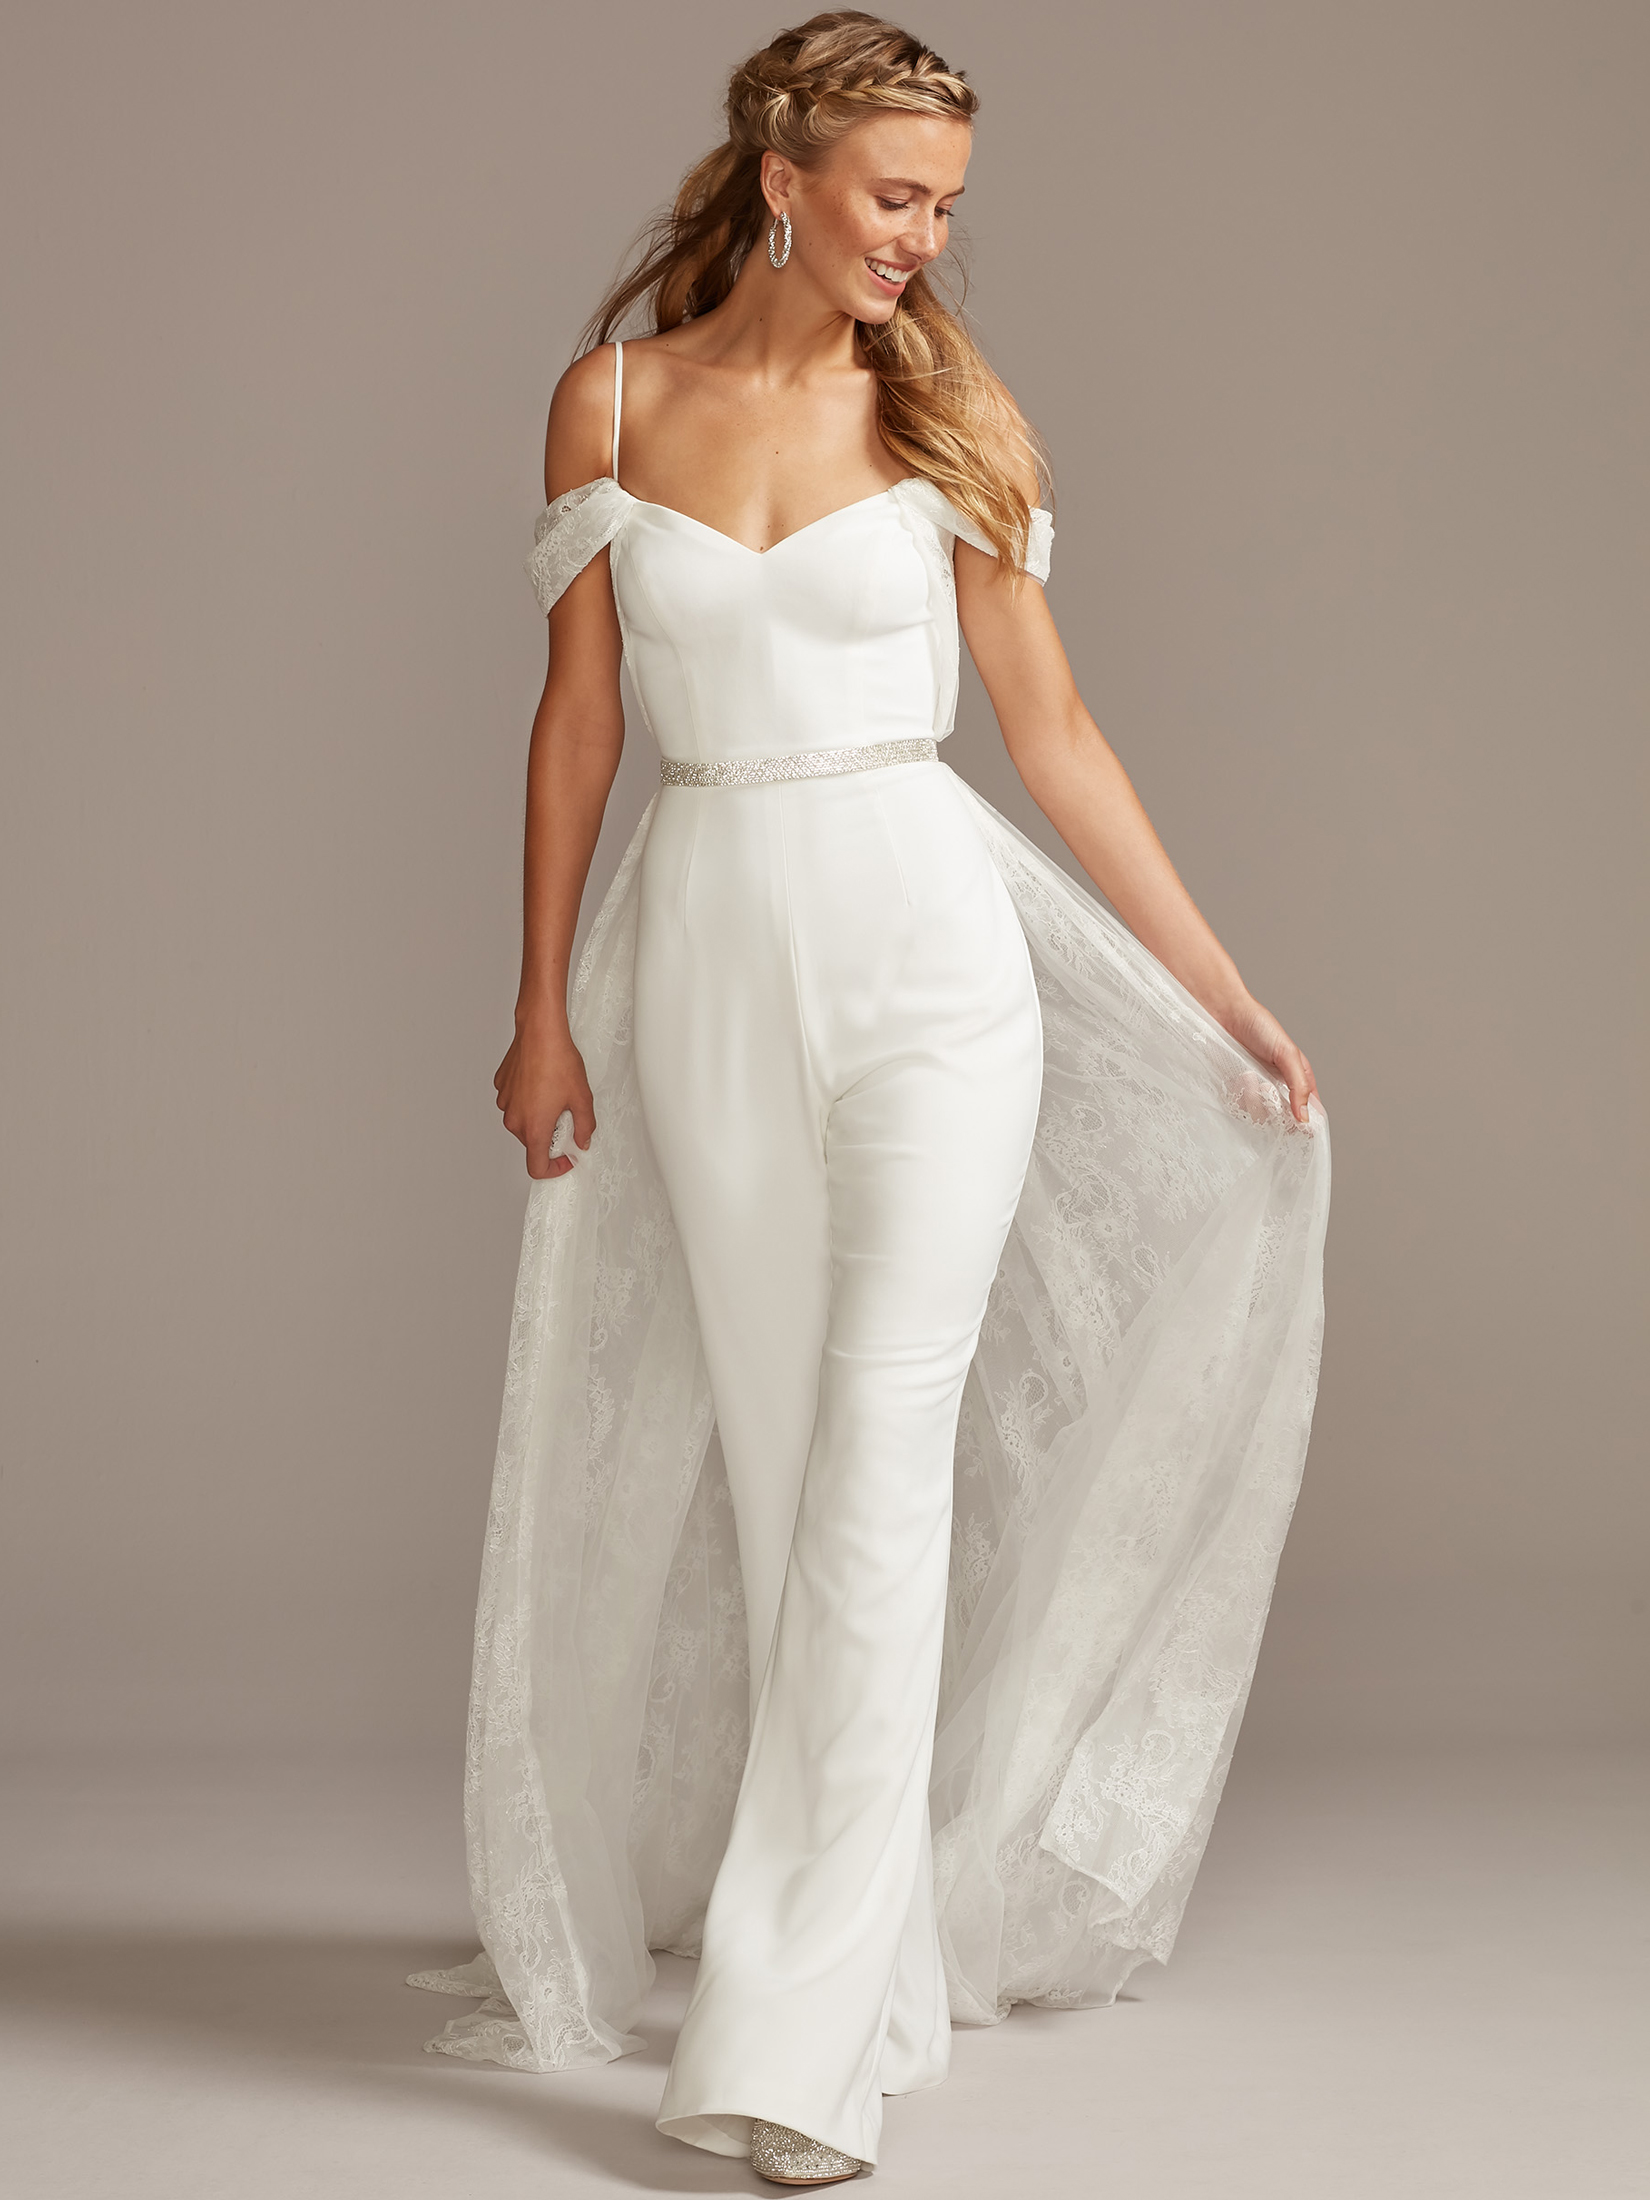 davids bridal melissa sweet off-the-shoulder wedding dress jumpsuit fall 2020